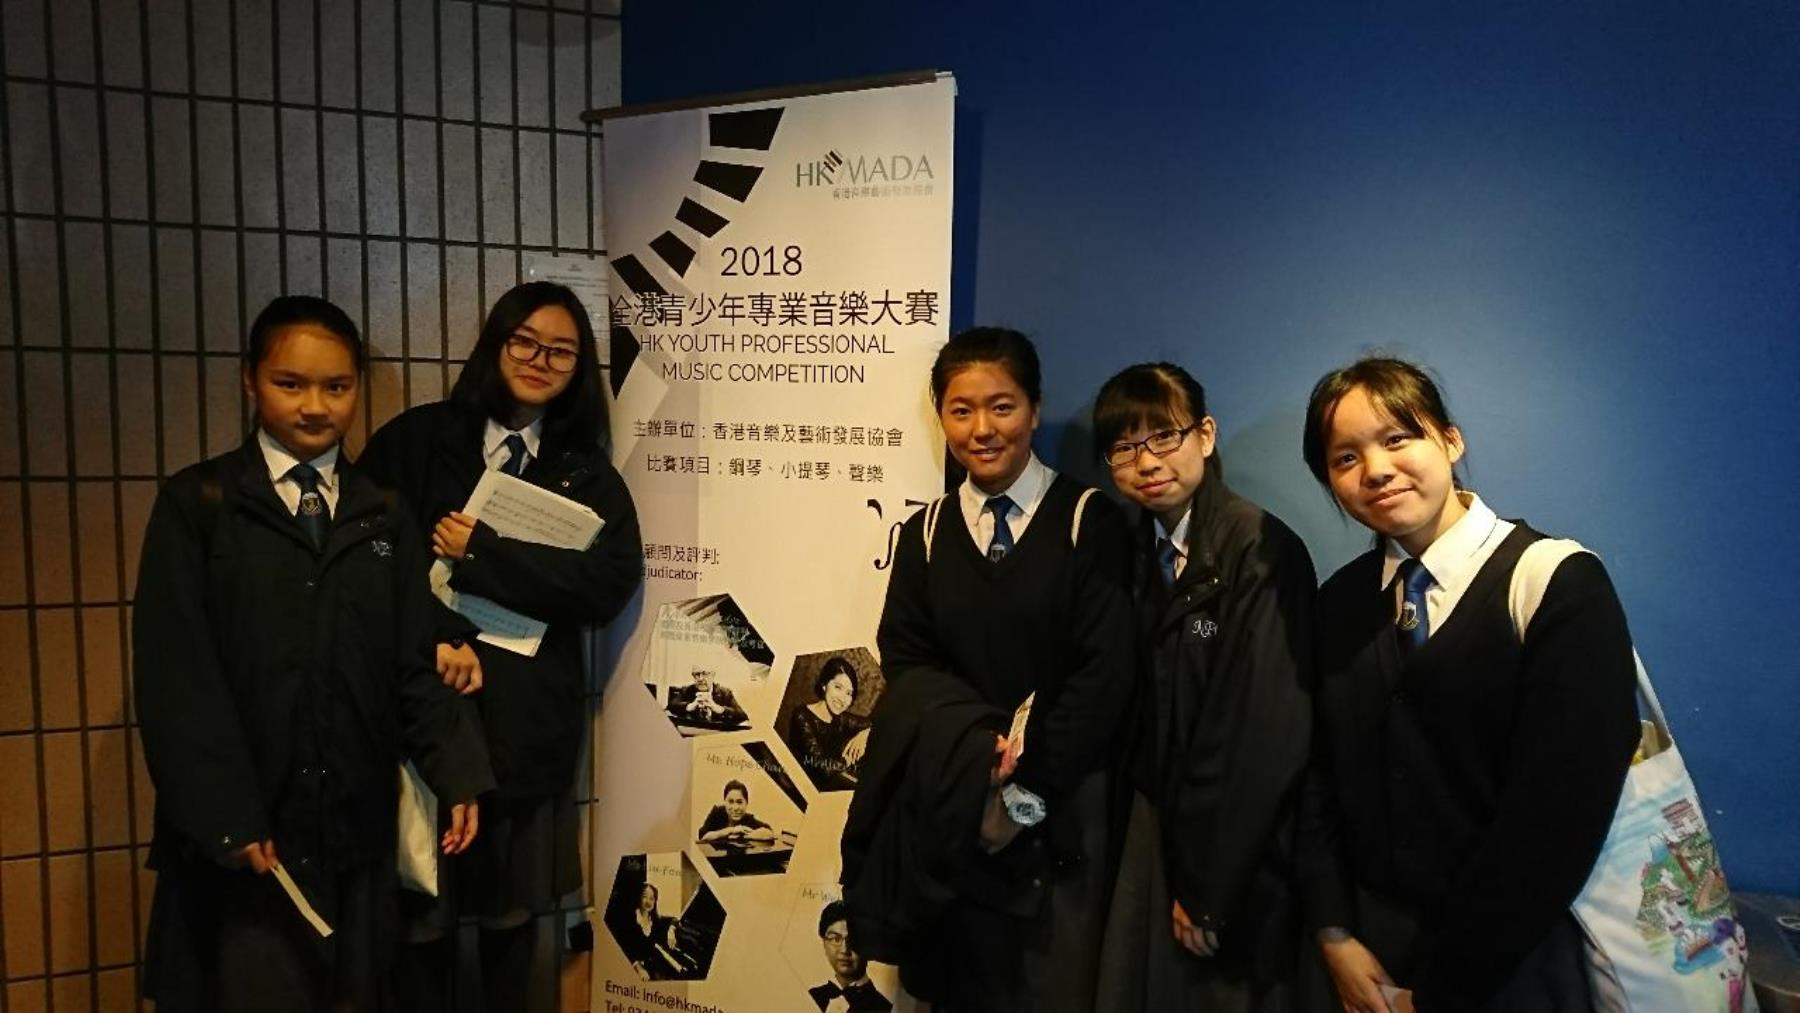 http://npc.edu.hk/sites/default/files/dsc_3959.jpg